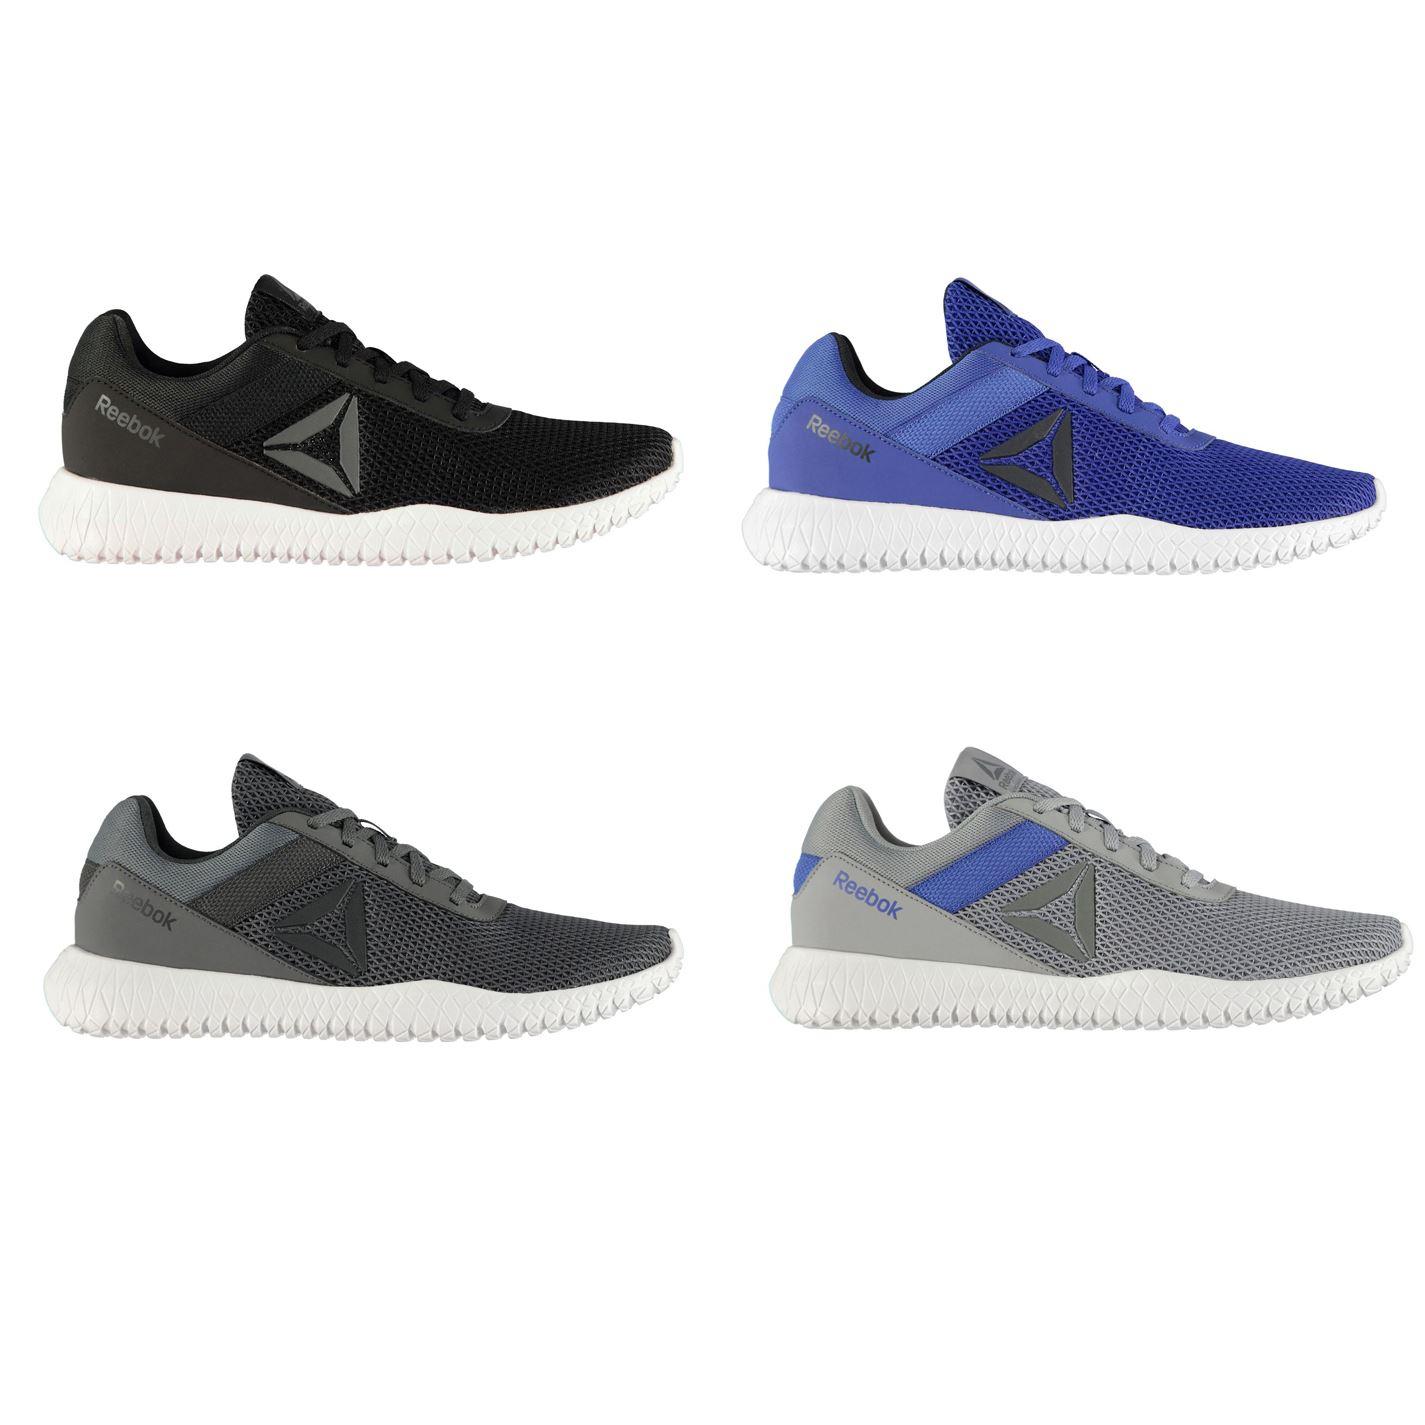 Reebok Flexagon Energy Mens Trainers Shoes Fitness Footwear Sneakers   eBay